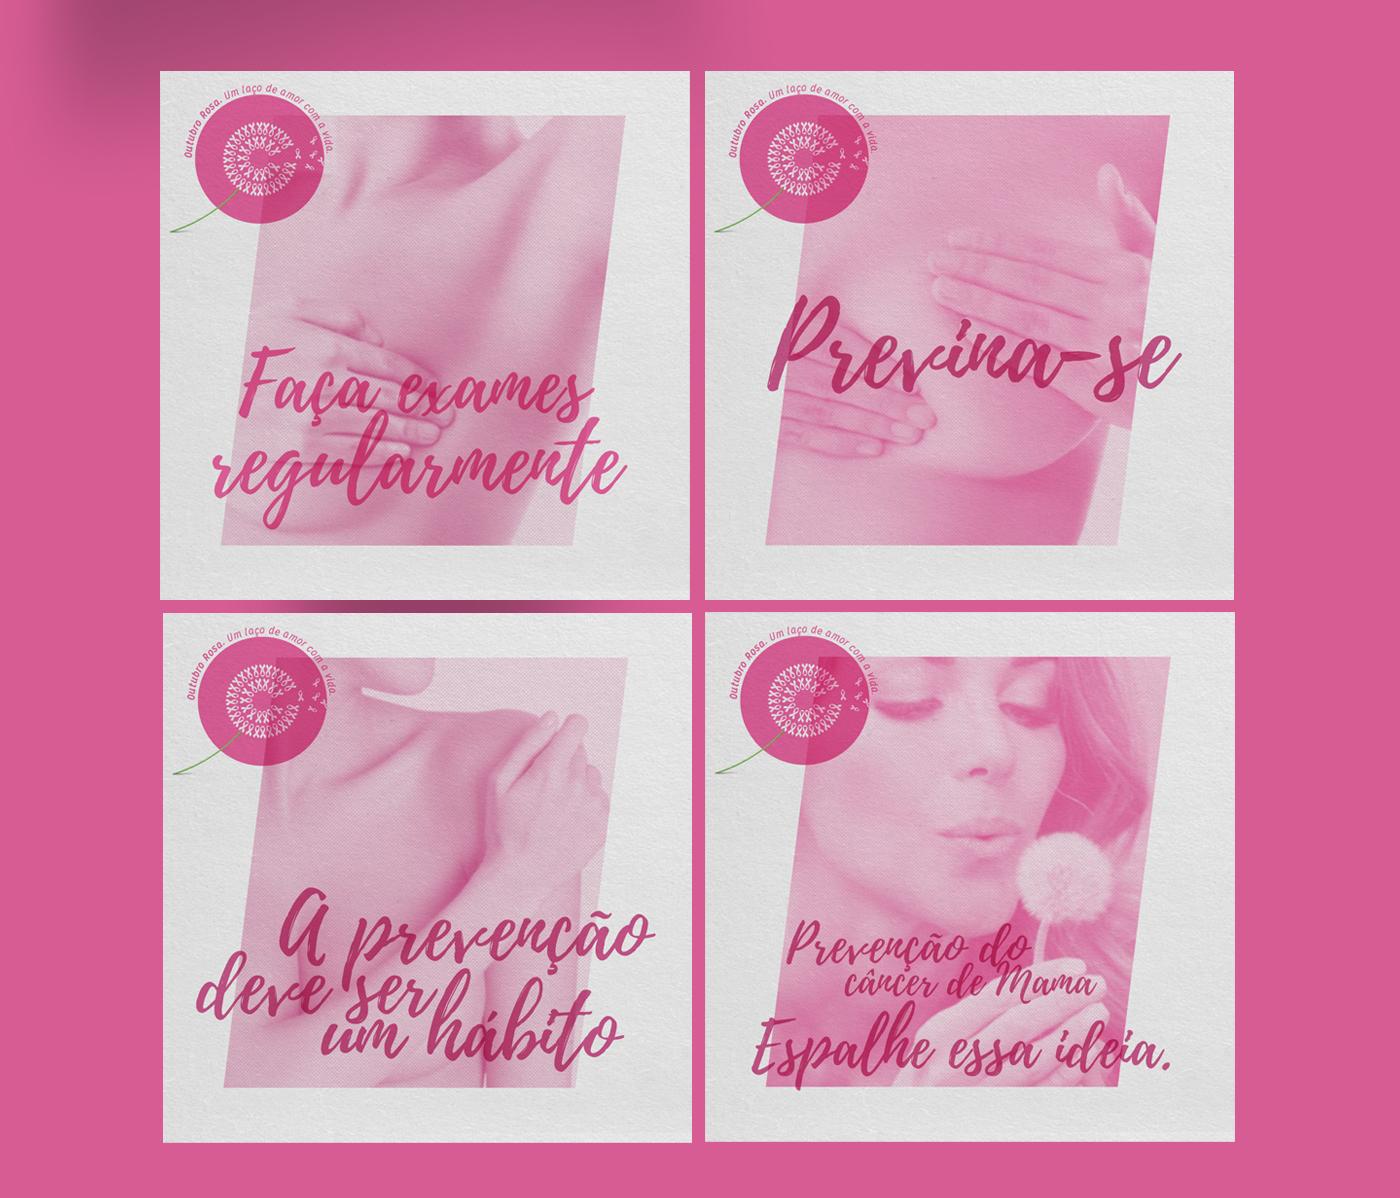 design Viação Garcia Brasil Sul Propaganda mídia social outubro rosa pink october facebook social media breast cancer awareness